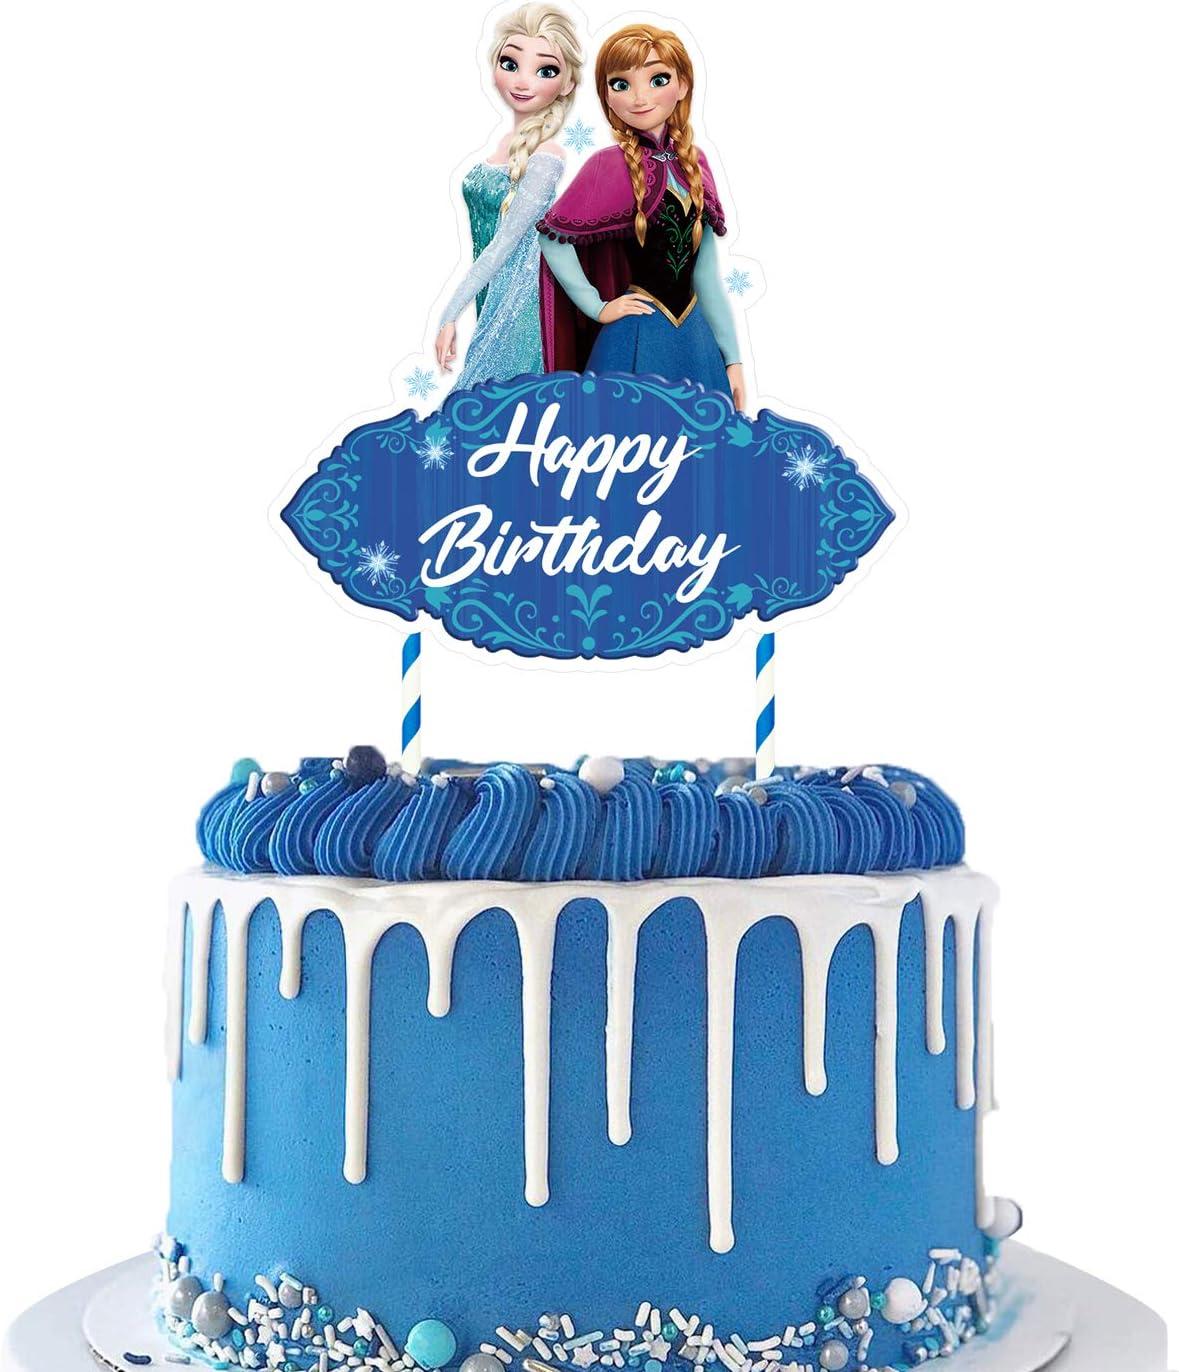 Personalised Cake Topper Snowflake Cake Topper Frozen Cake Topper